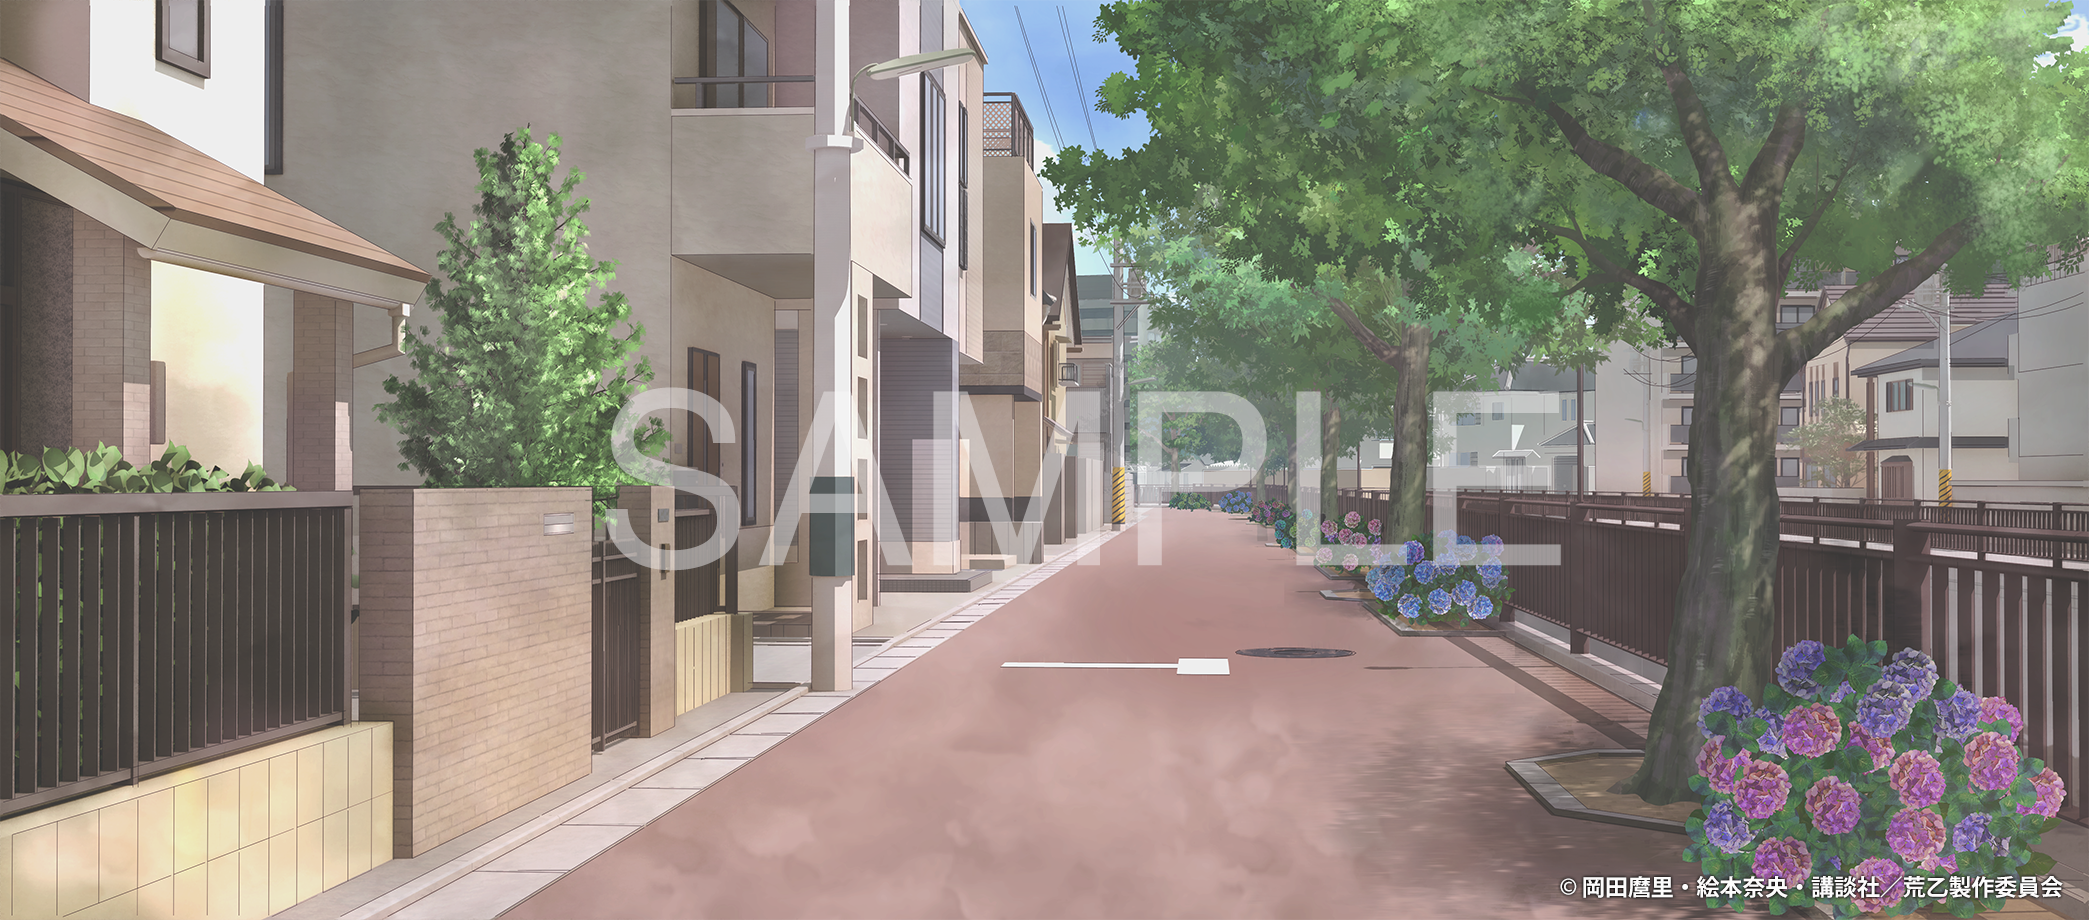 #01_和紗・泉の家外観_提出_RRRR_web